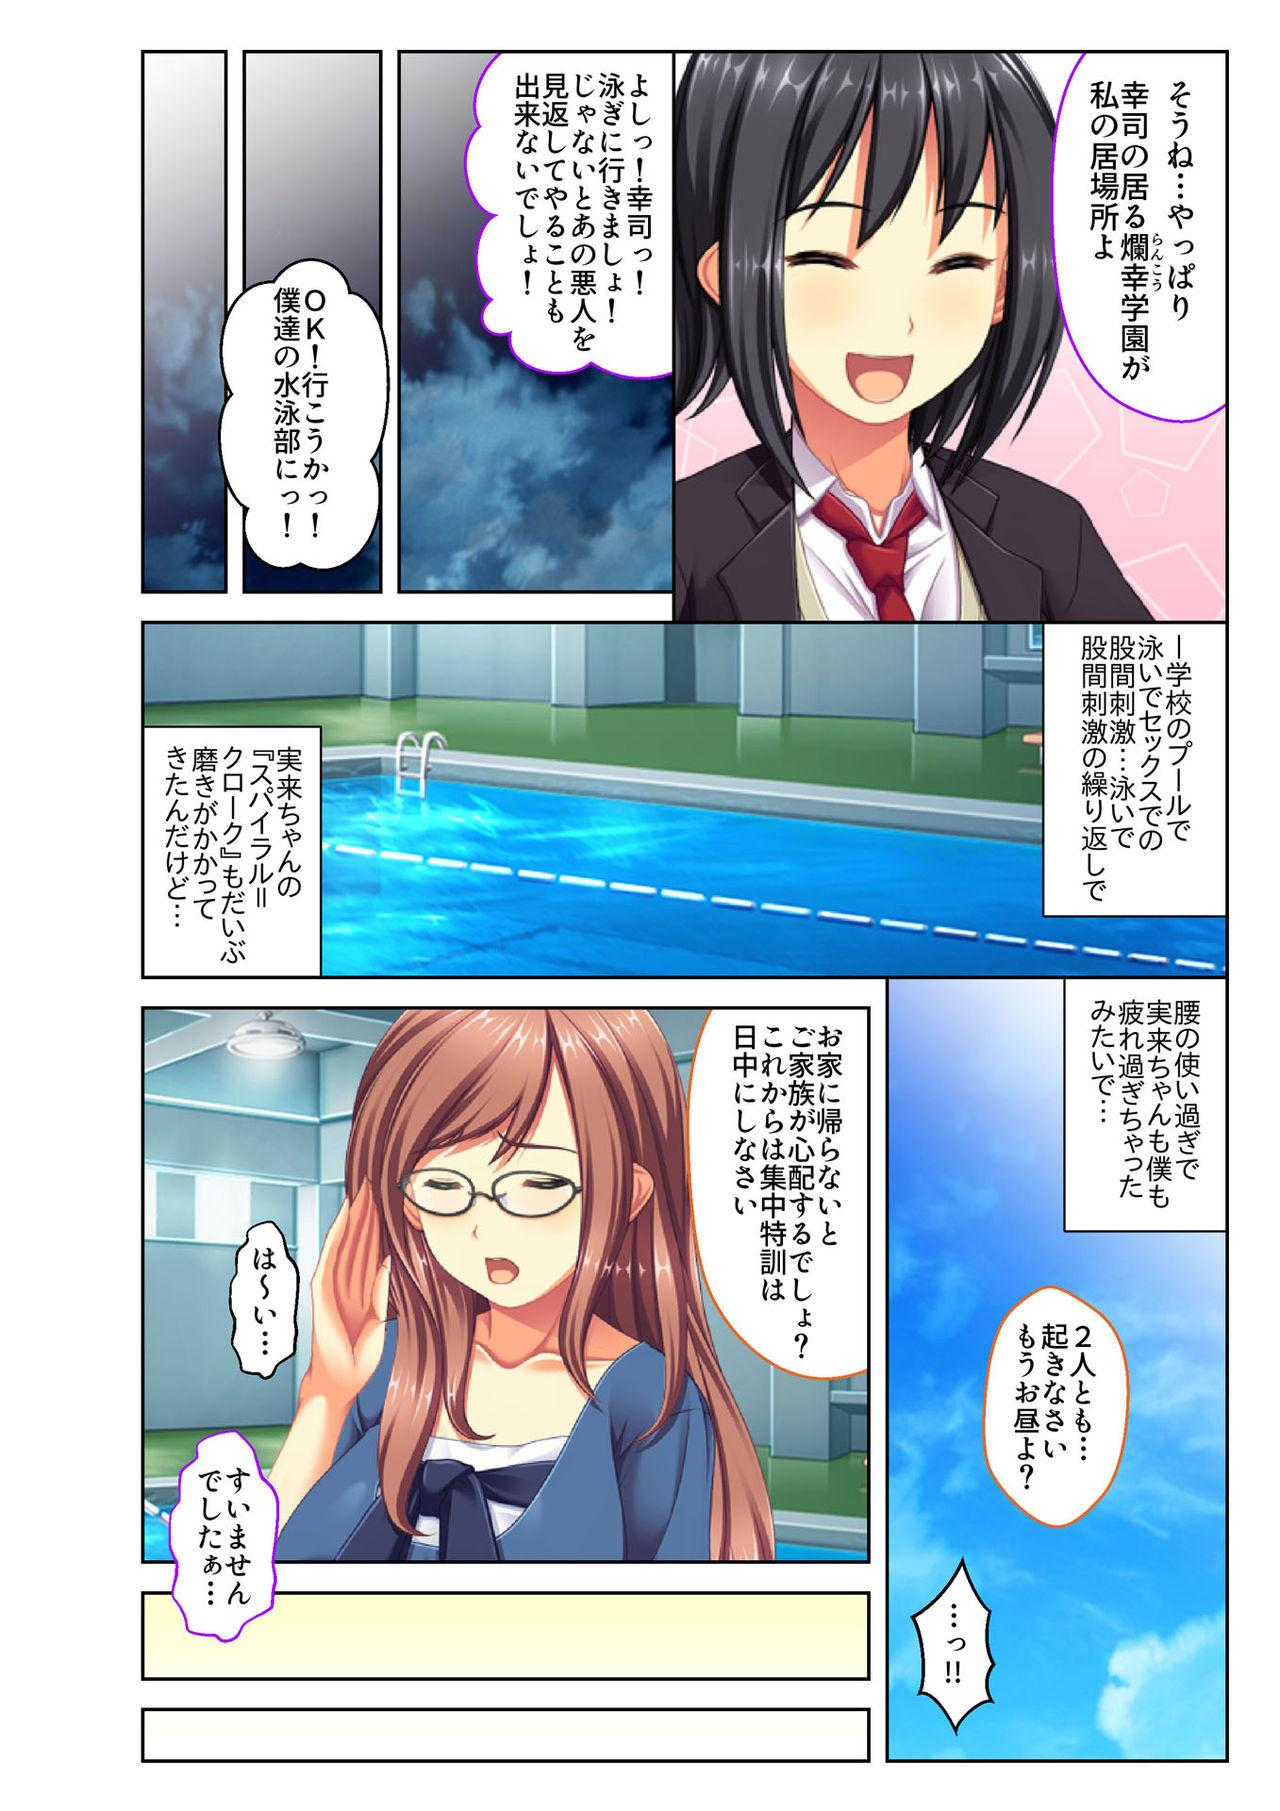 [Drops!] Gohoubi Ecchi! ~Mizugi o Zurashite Sukinadake~ 4 10